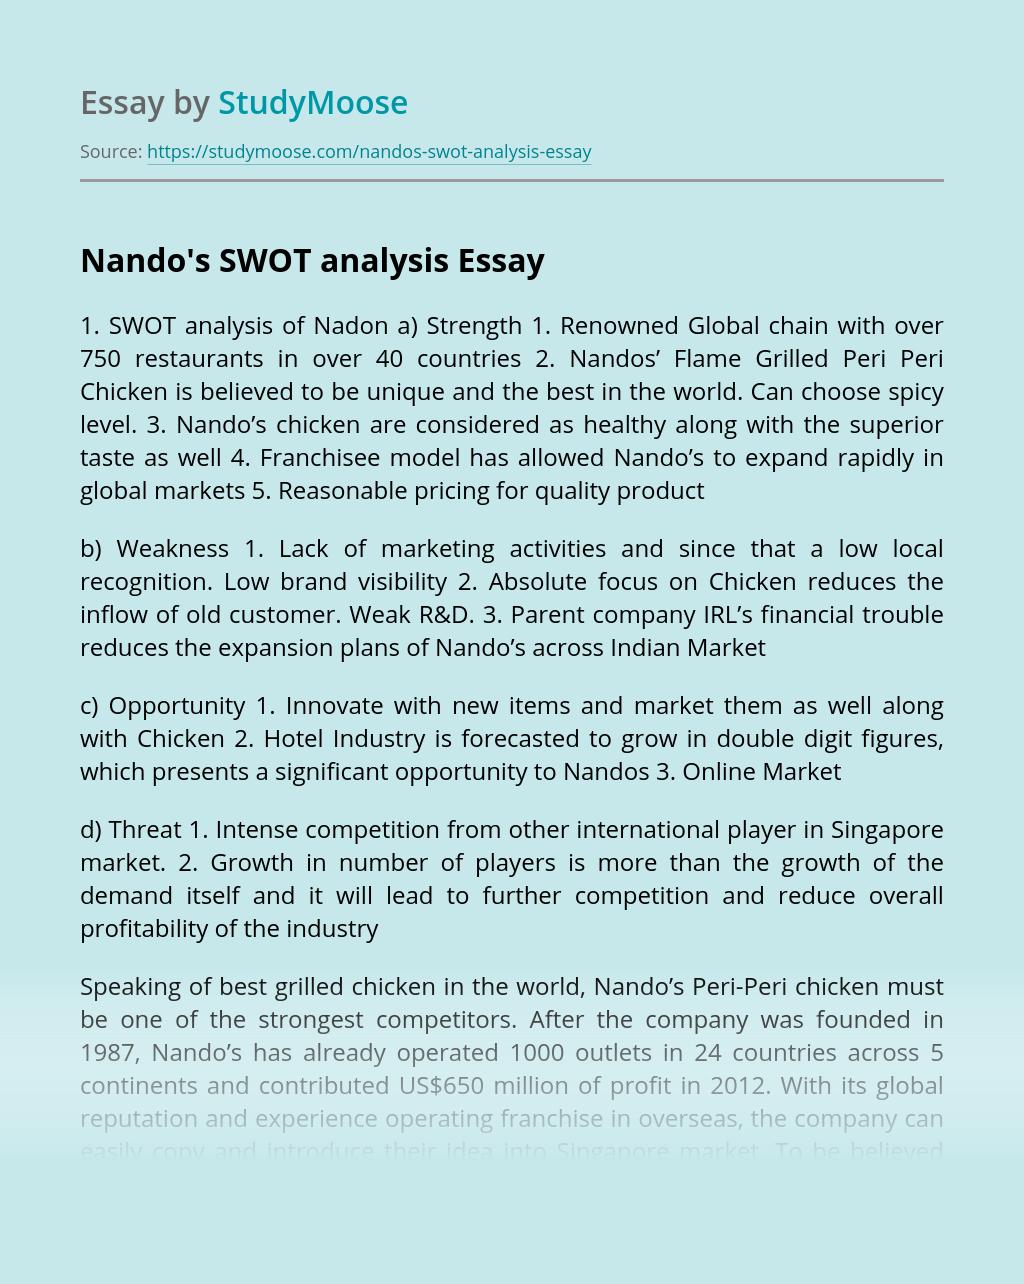 Nando's SWOT analysis